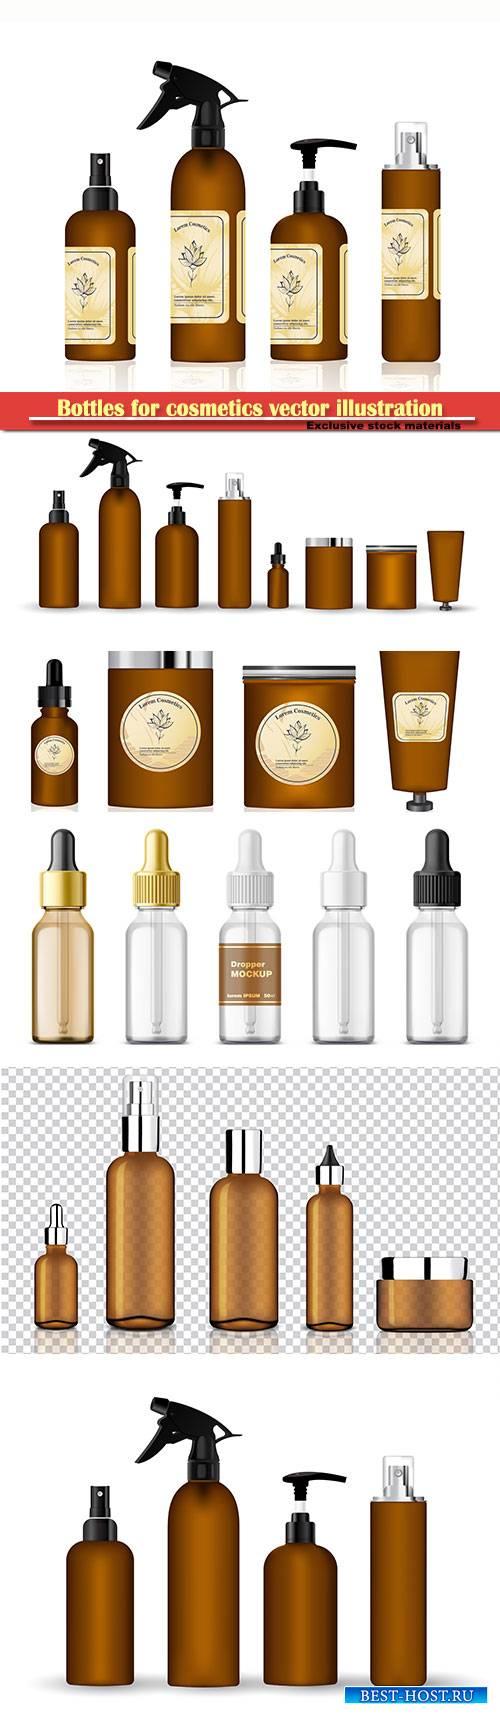 Bottles for cosmetics vector illustration